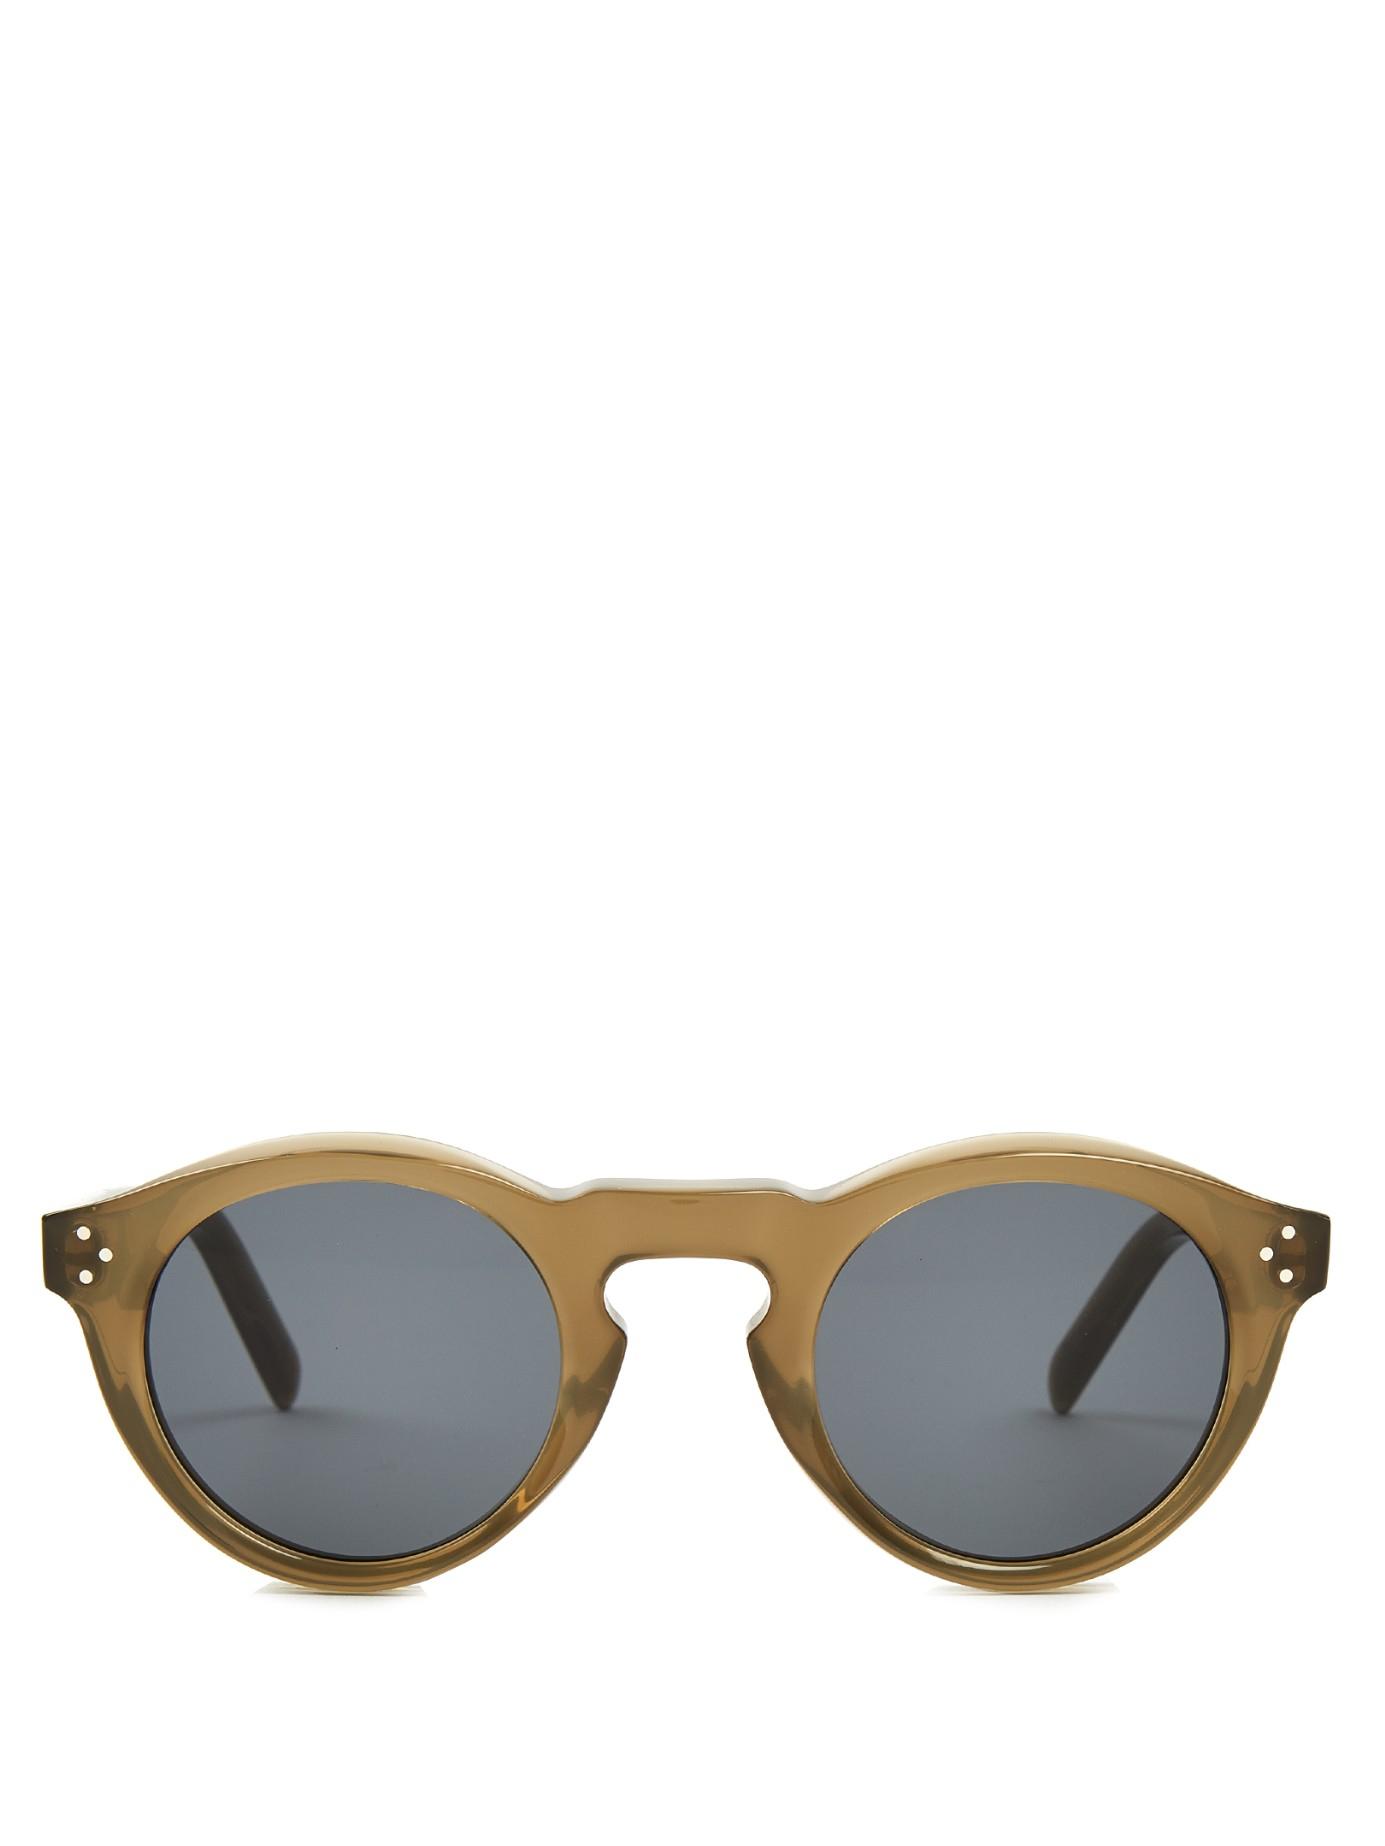 683d8736a484 Lyst - Céline Round-frame Acetate Sunglasses in Green